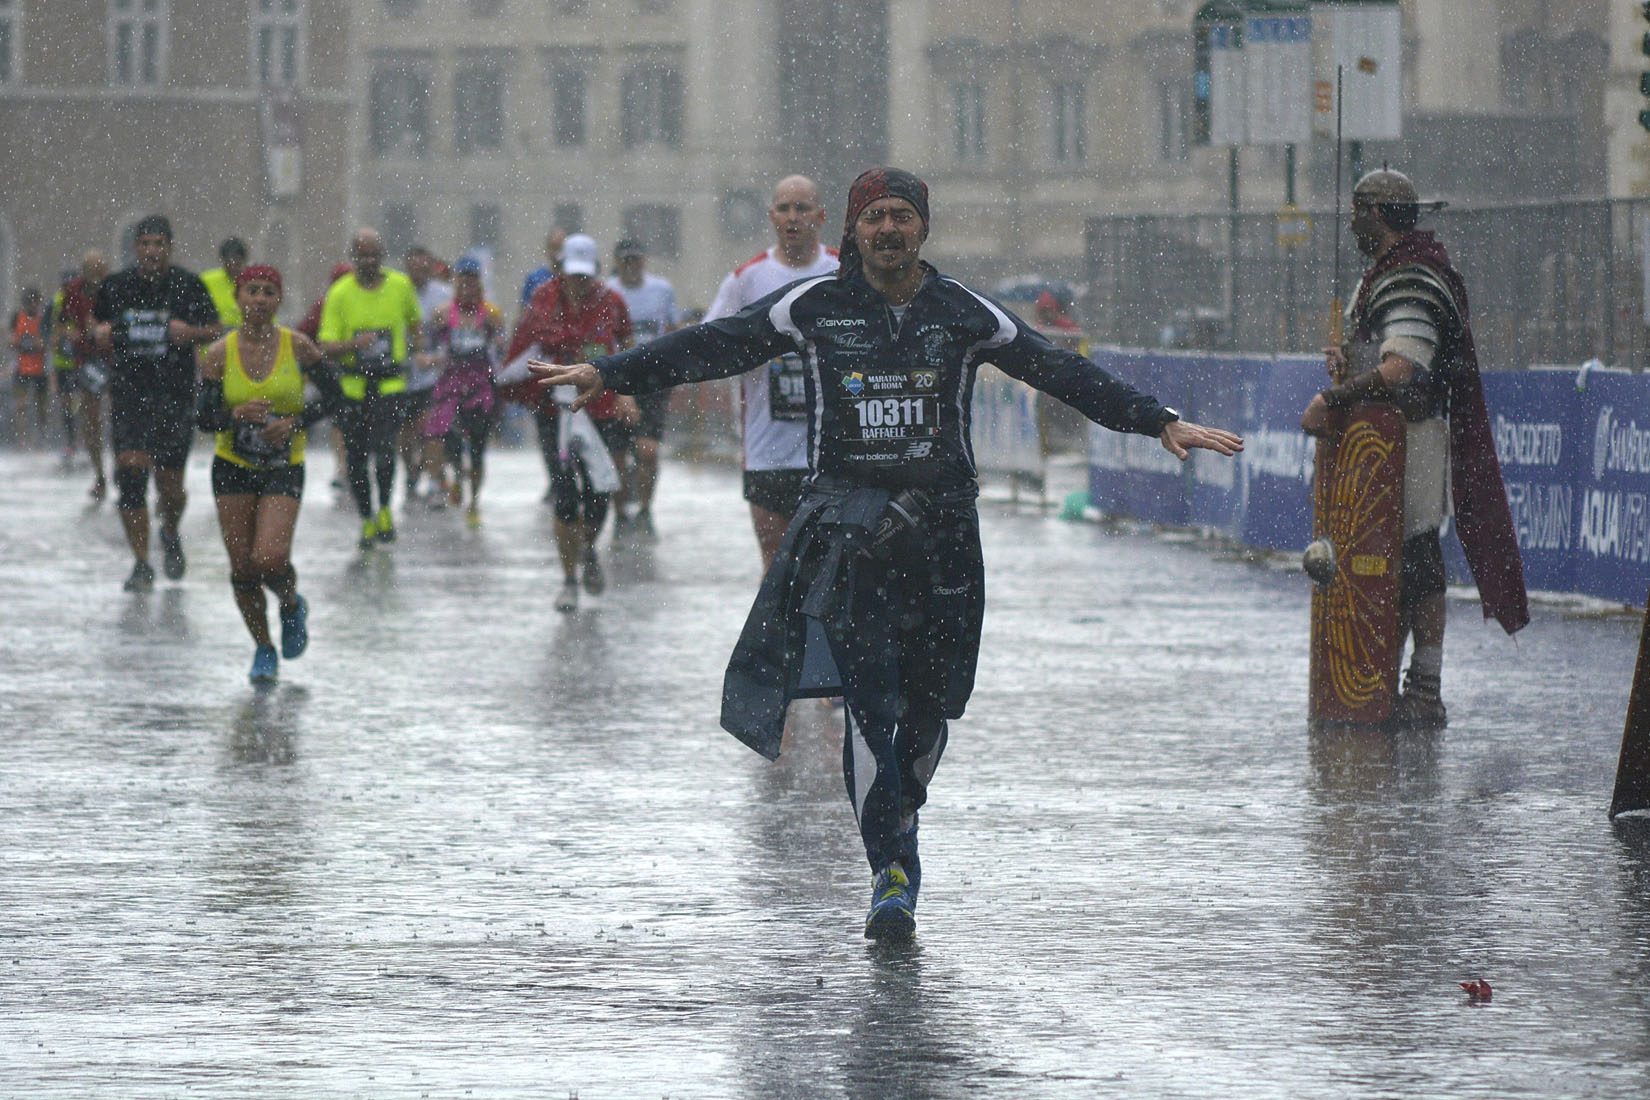 http://blog.ilgiornale.it/ruzzo/files/2014/03/Maratonaroma.jpg